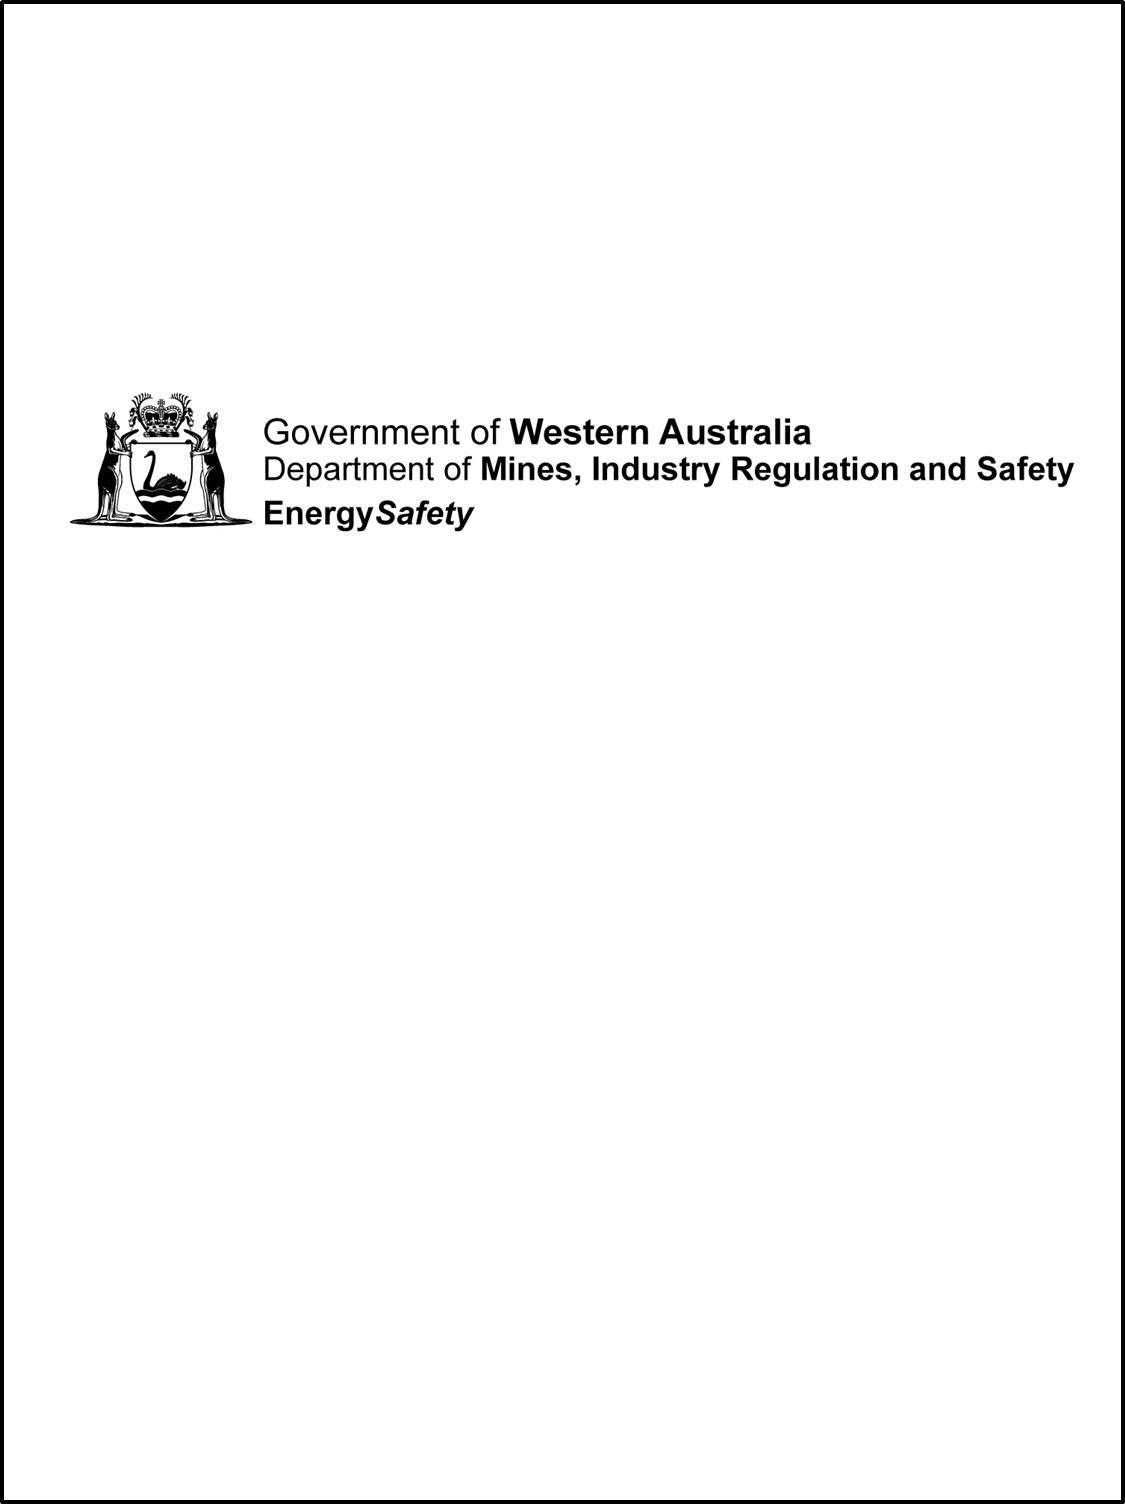 Energysafety Industry Briefing 2018 Bunbury 12 Apr Australian Wiring Regulations